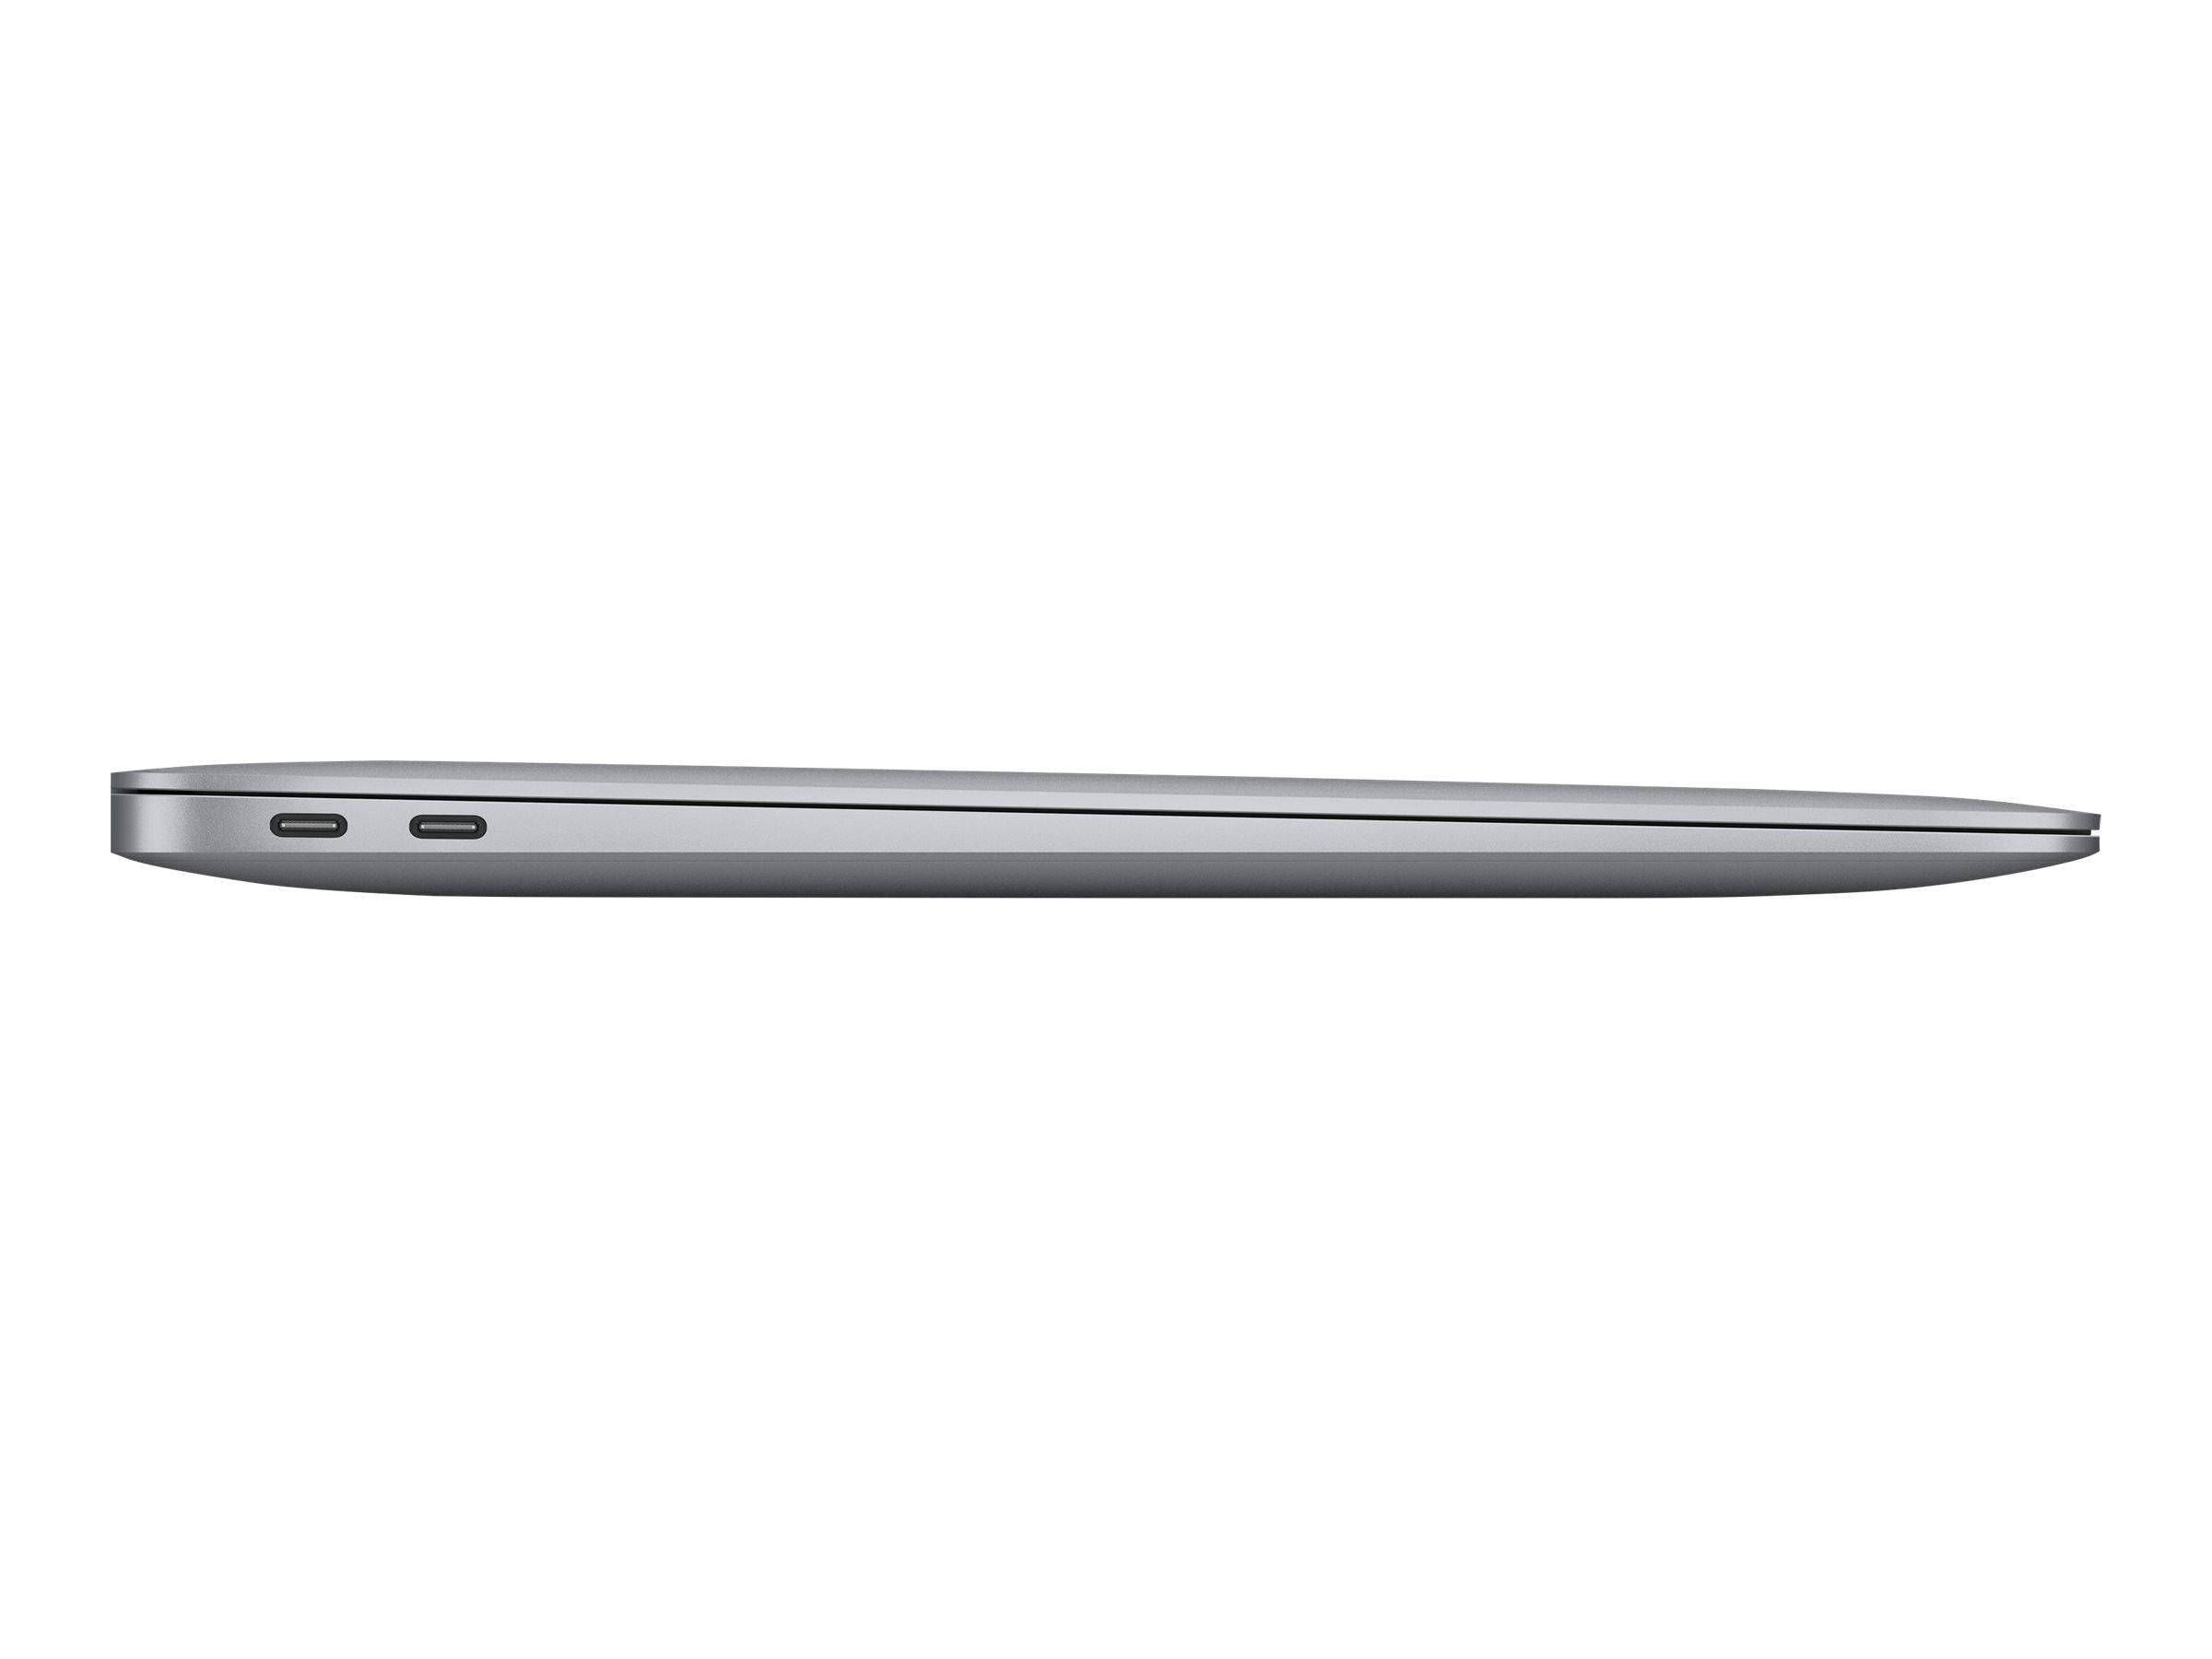 "Apple MacBook Air with Retina display - M1 - macOS Big Sur 11.0 - 8 GB RAM - 256 GB SSD - 33.8 cm (13.3"")"